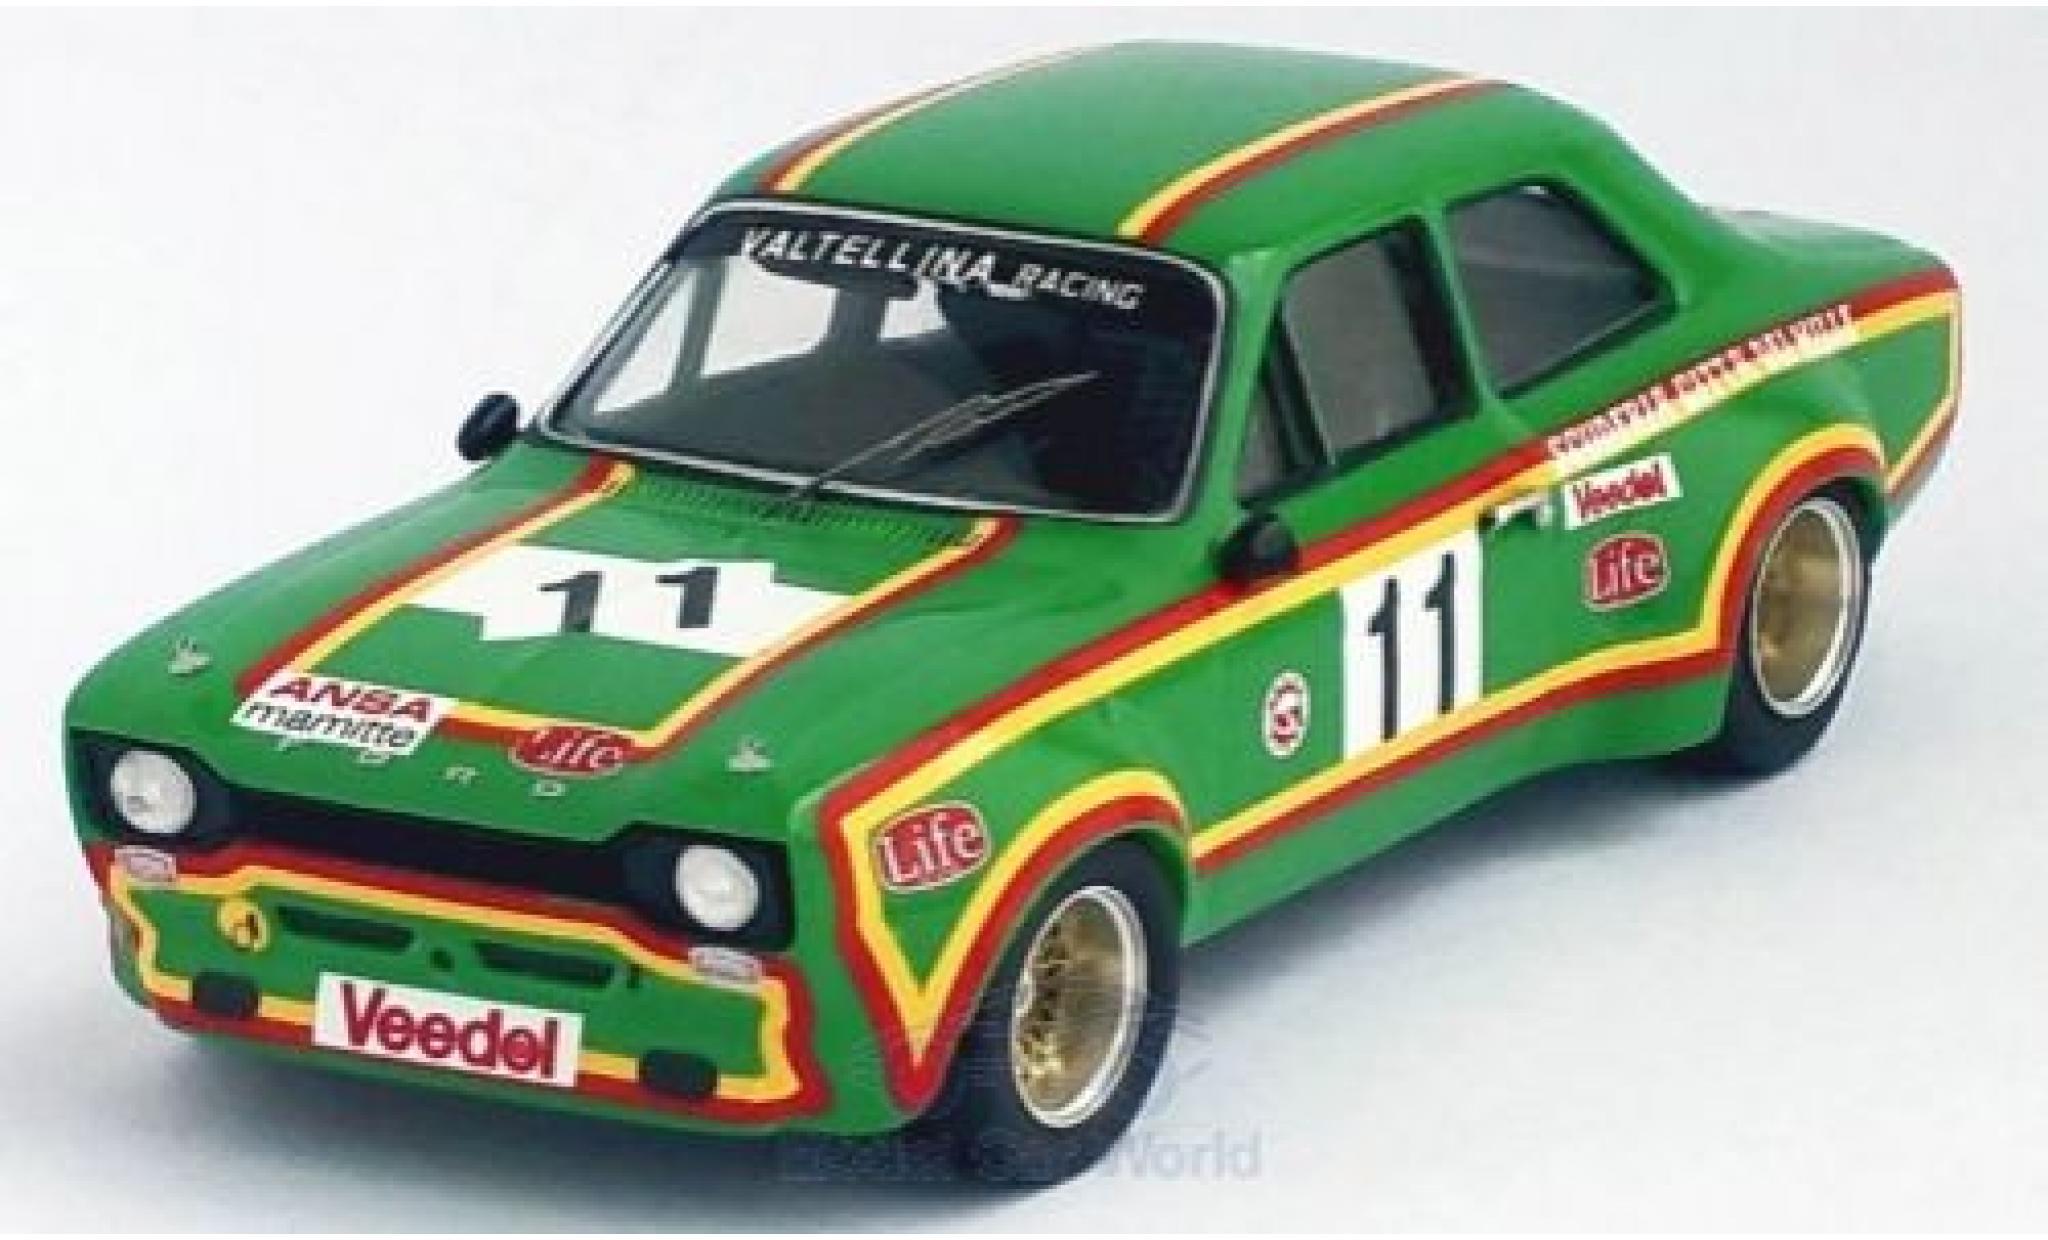 Ford Escort 1/43 Trofeu MK I No.11 Valtellina Racing Monza 1975 A.Merzario